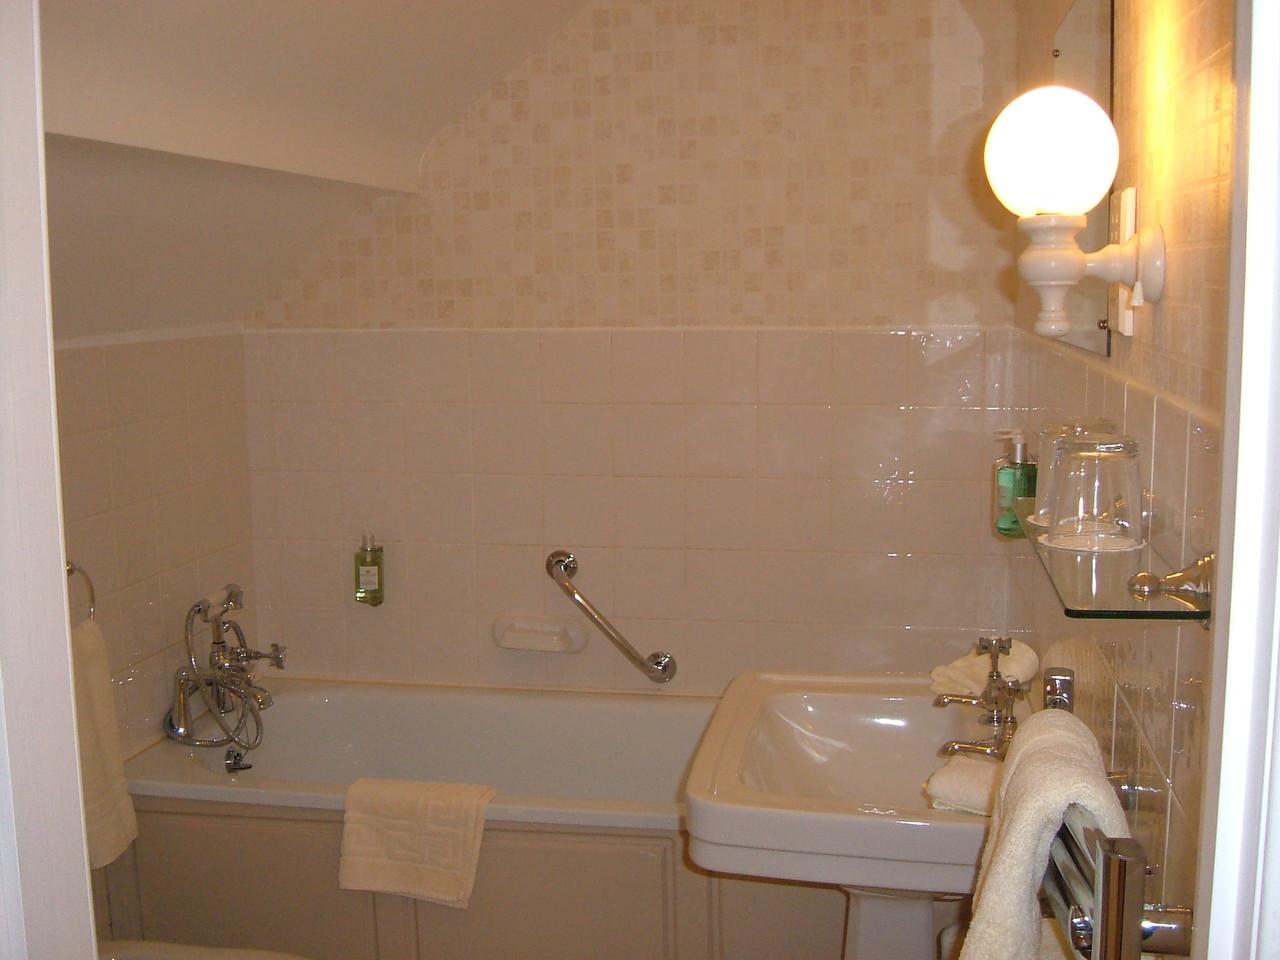 Hereford bathroom